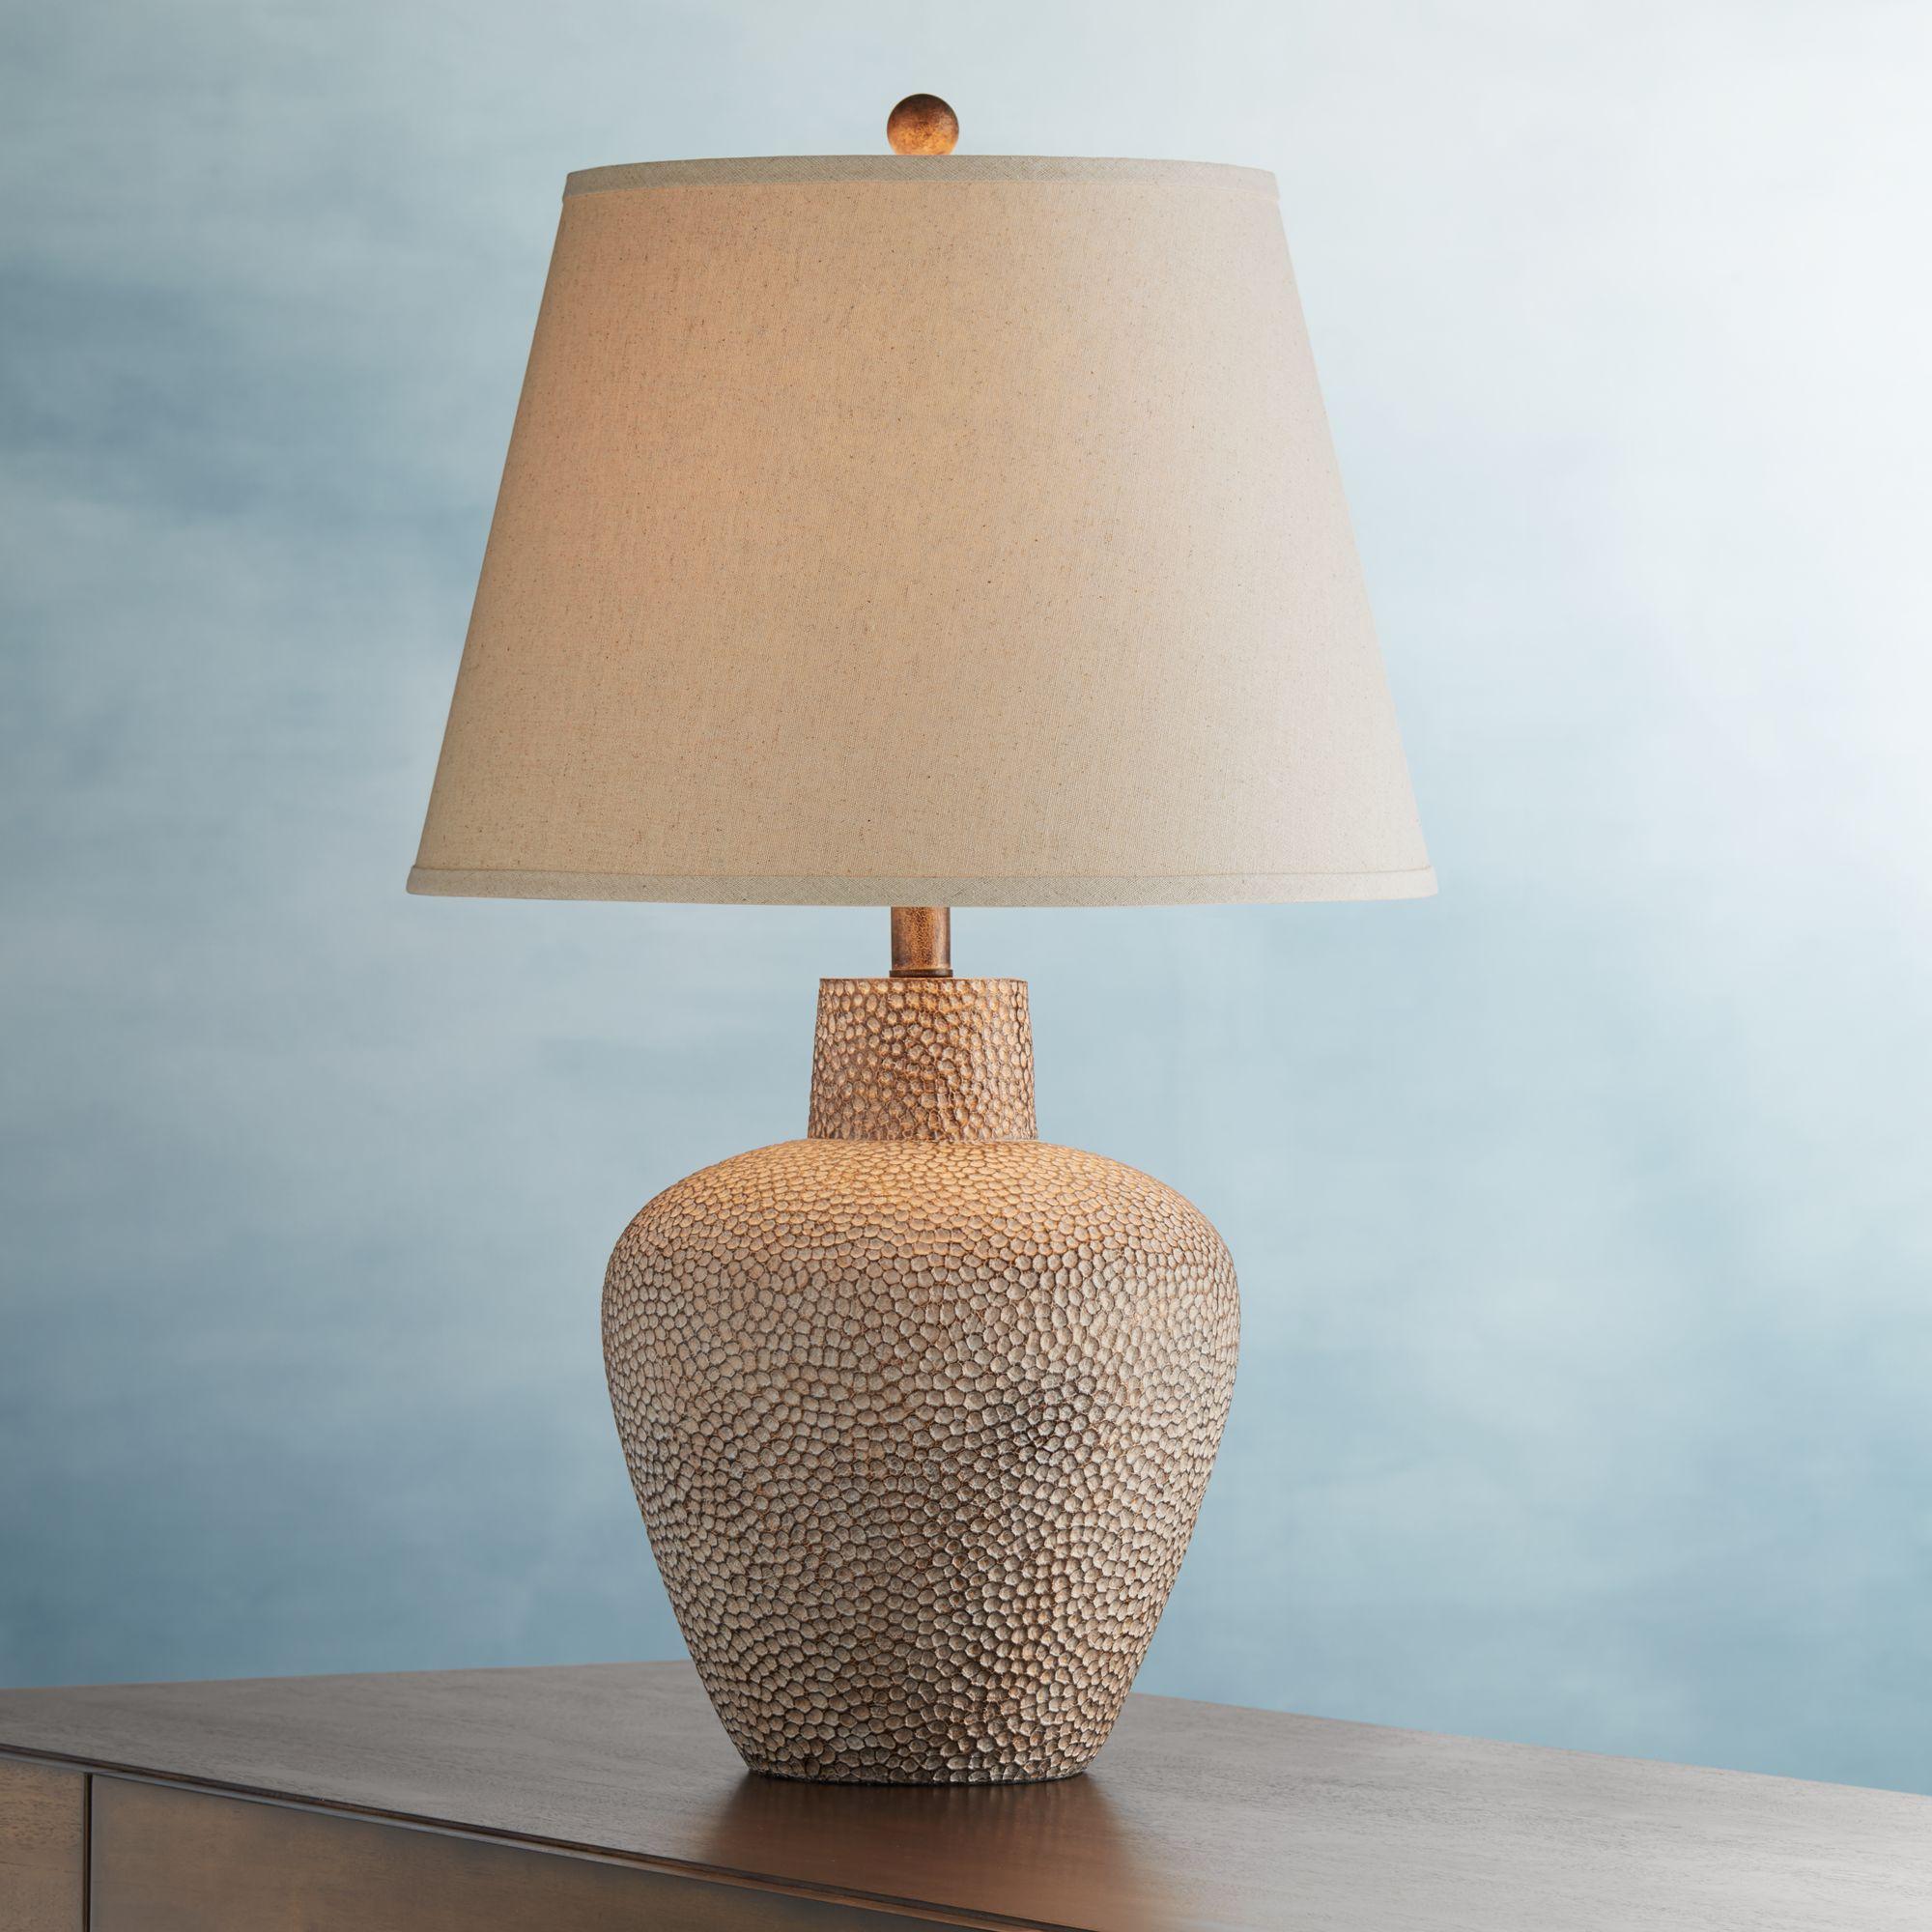 360 Lighting Rustic Table Lamp Hammered Metal Pot Brown Leaf Off